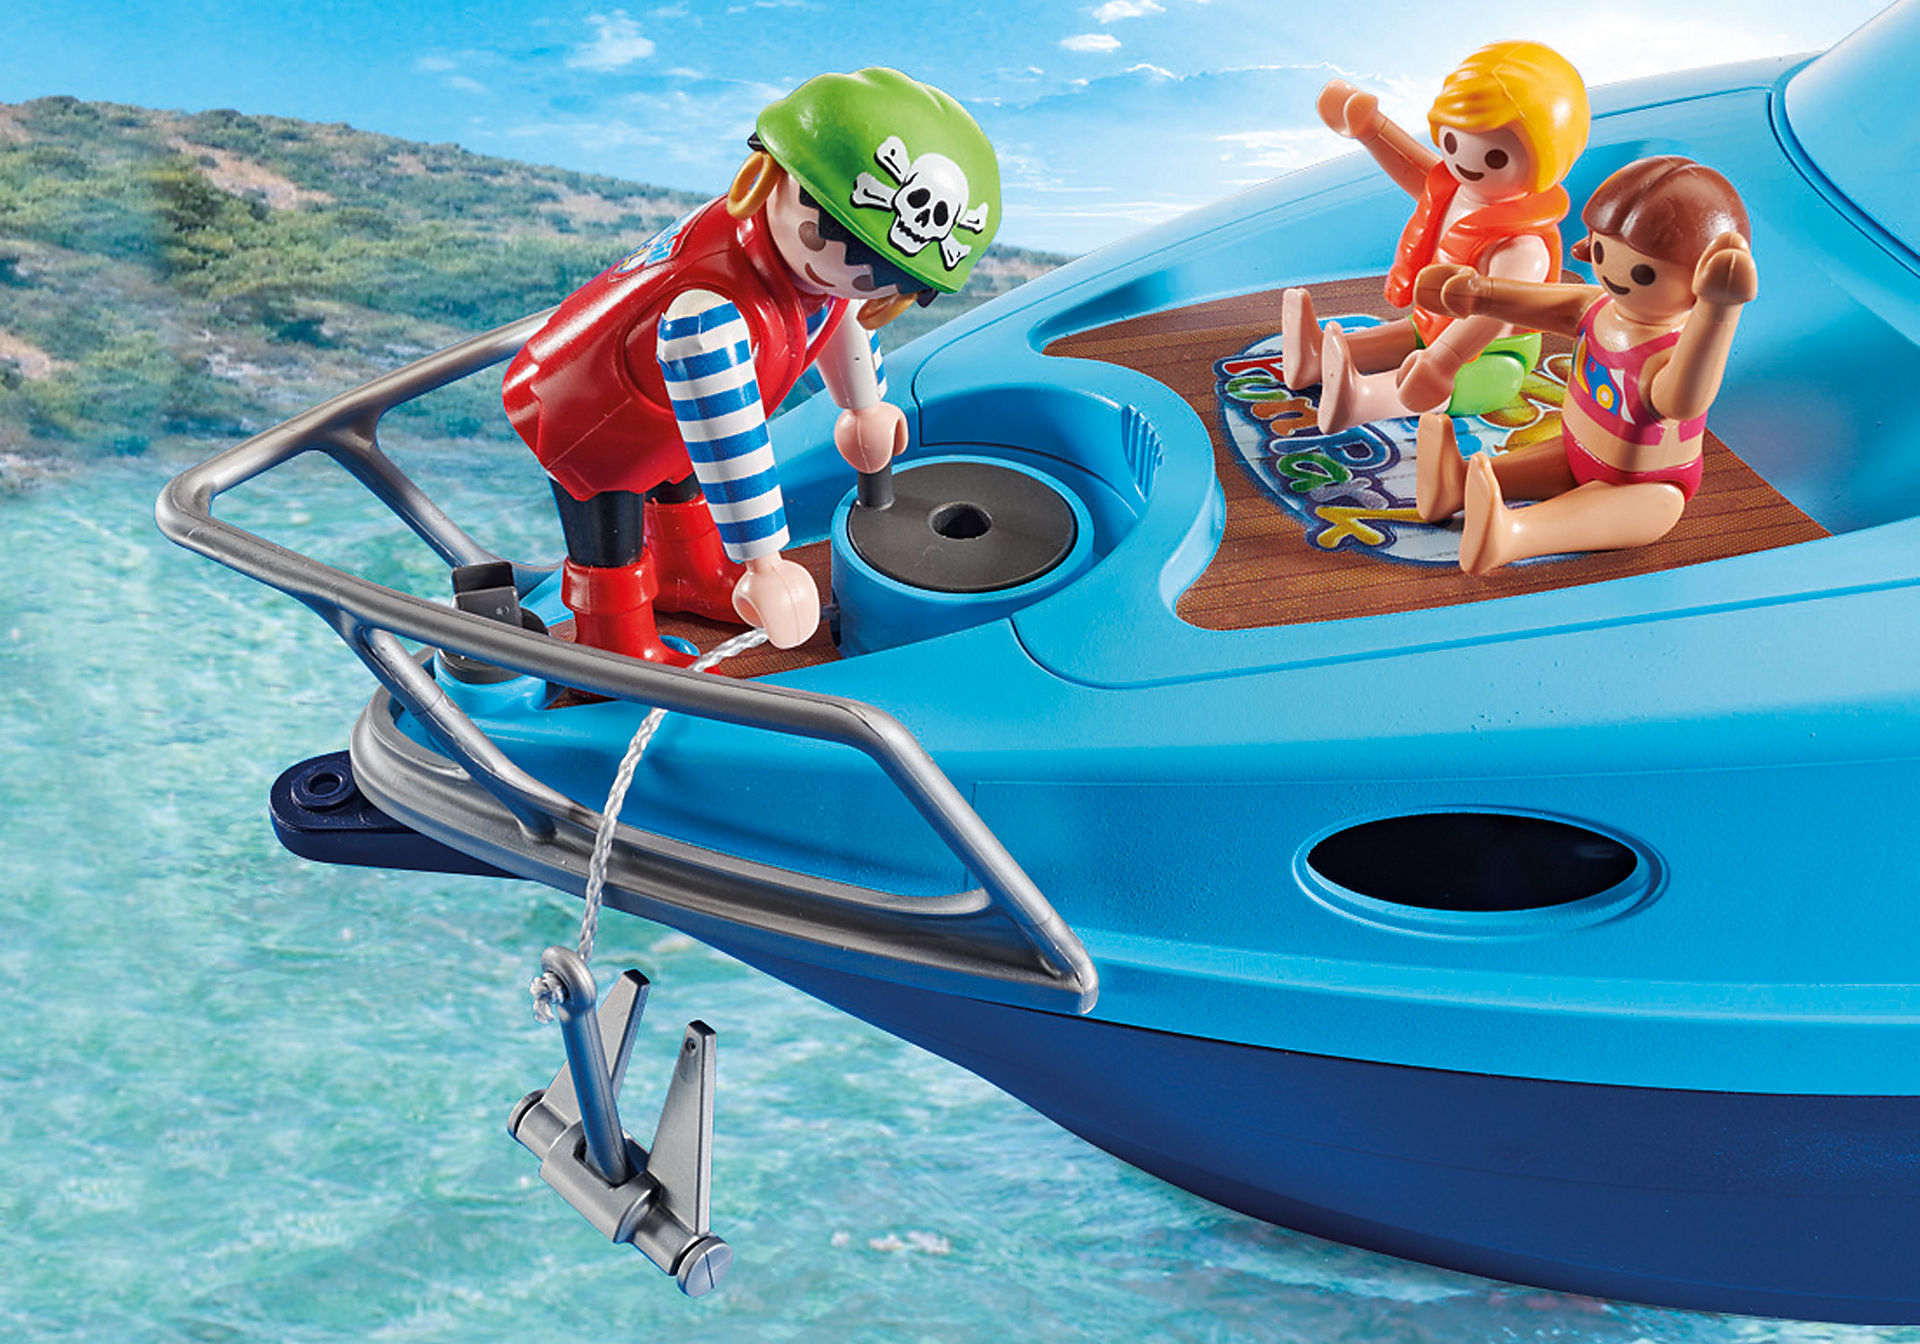 70630 PLAYMOBIL-FunPark Yacht mit Jet Ski zoom image4